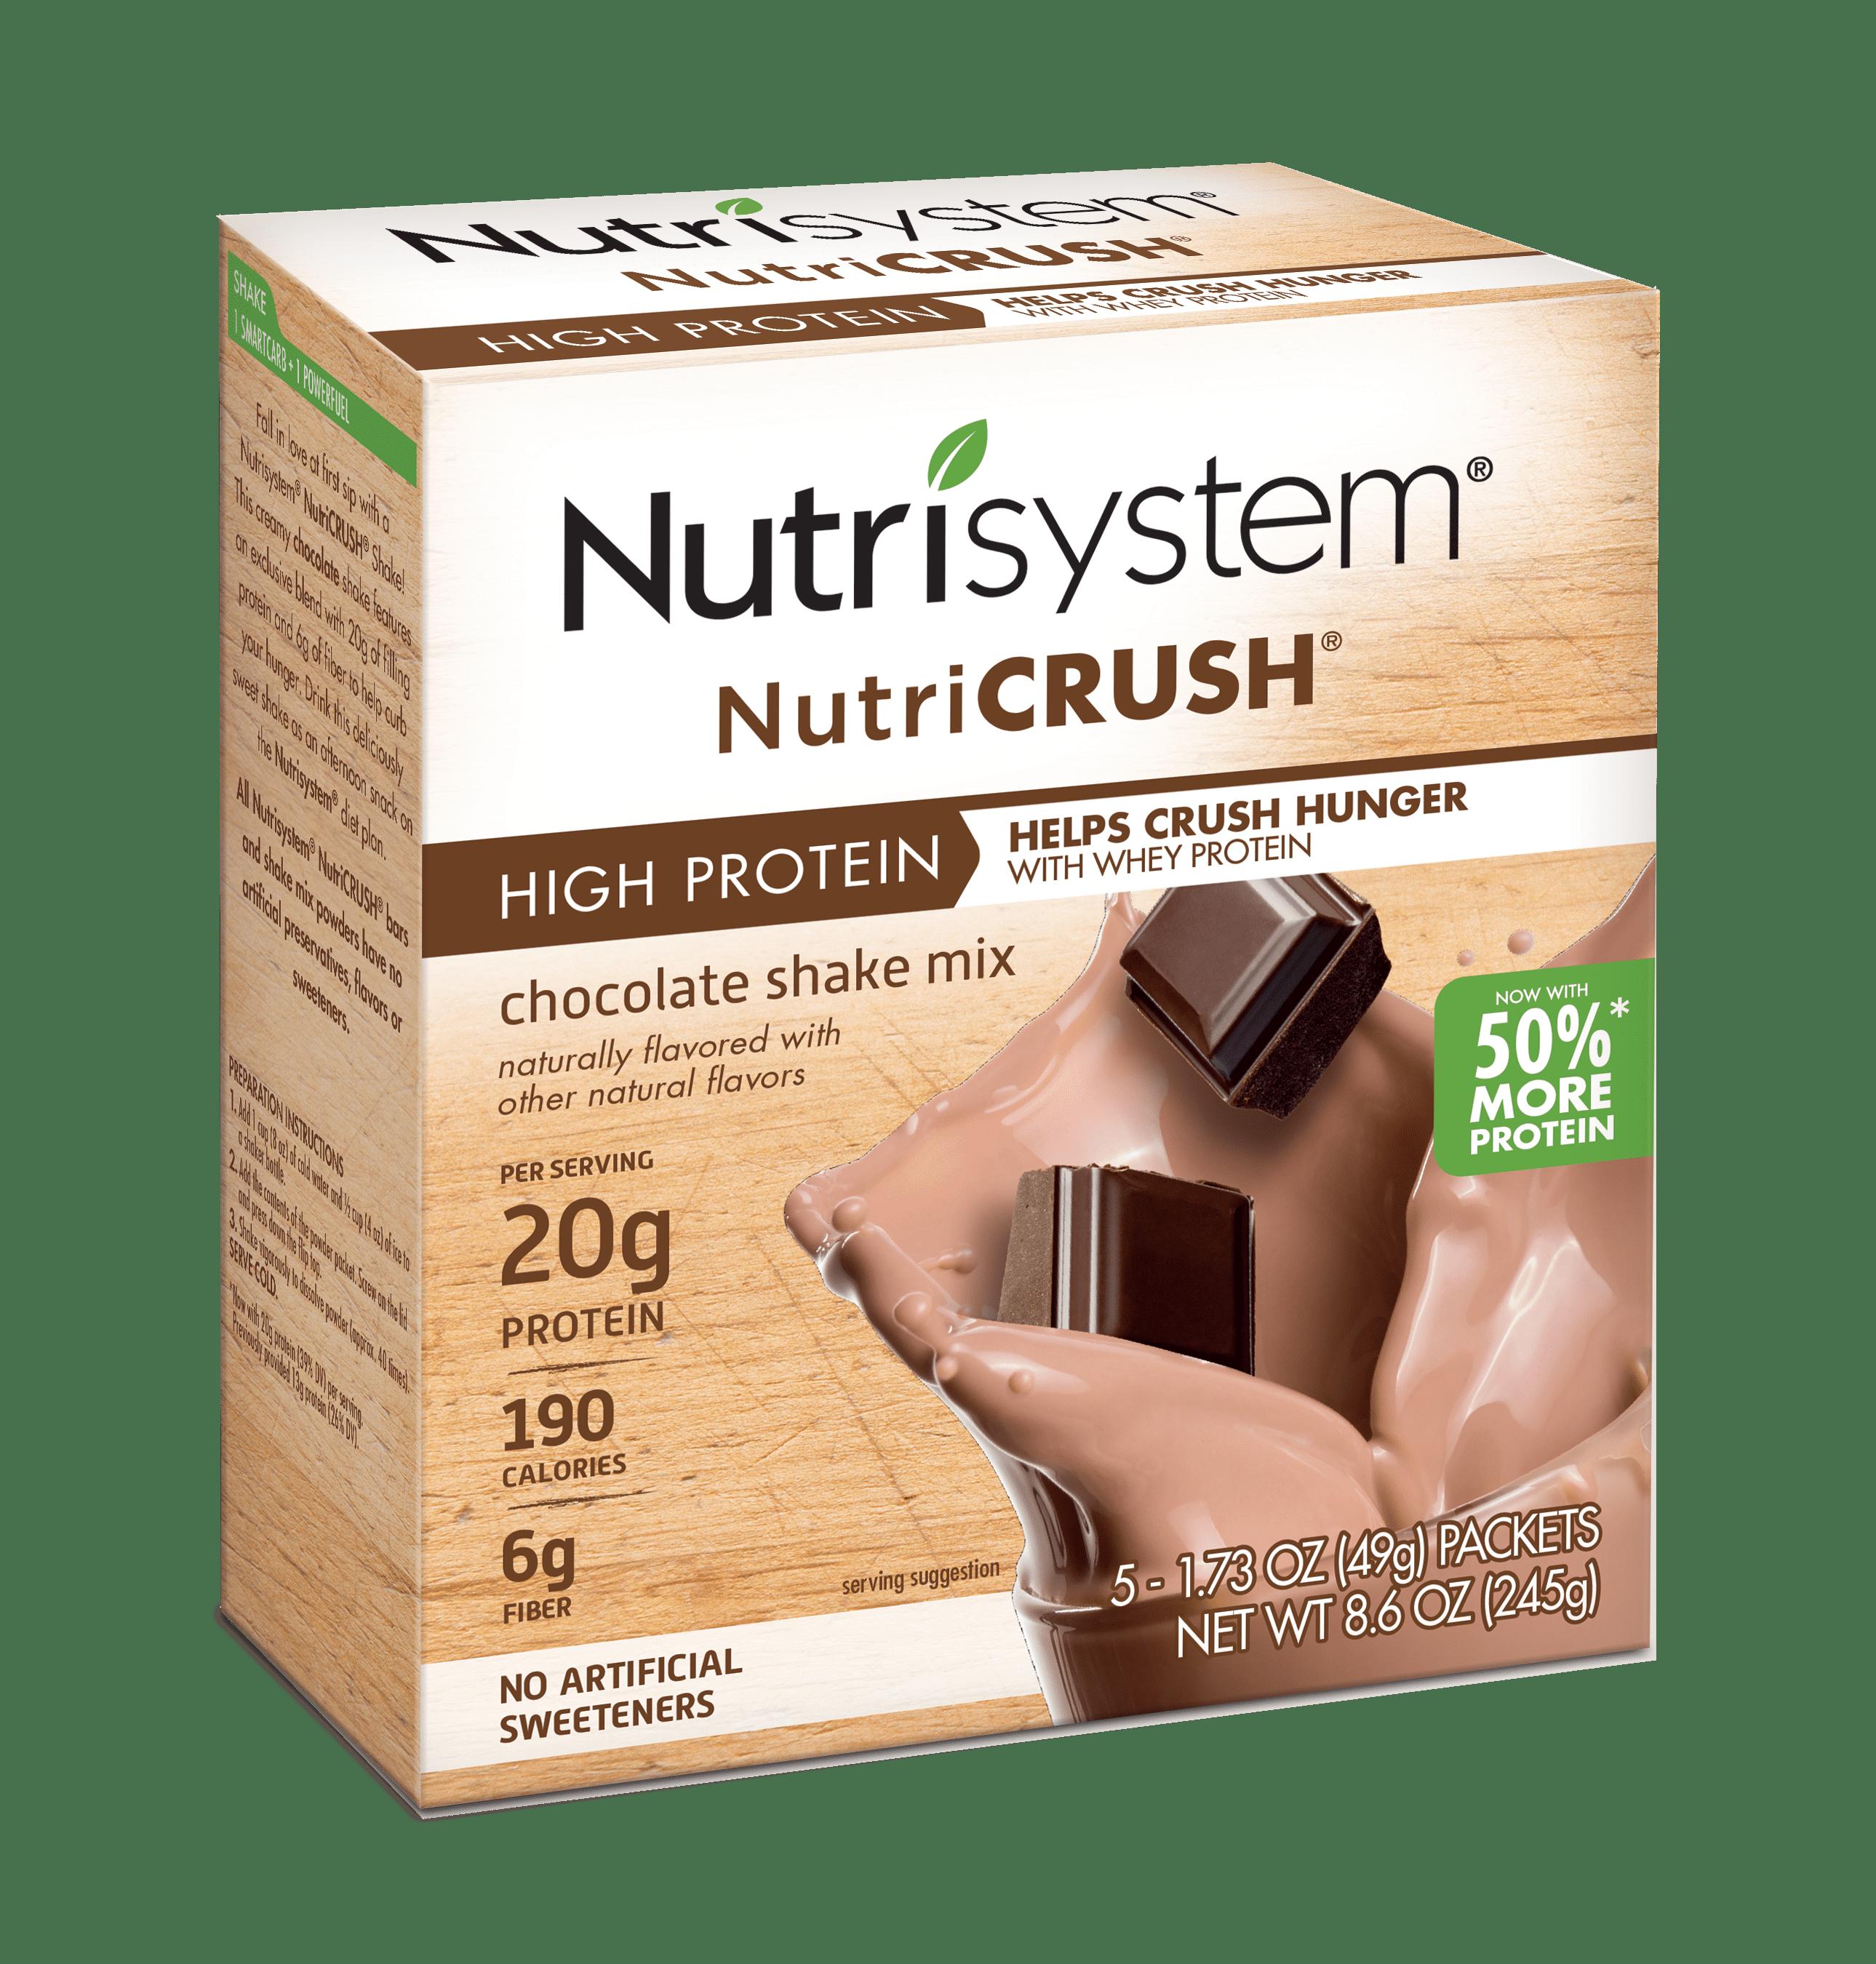 Nutrisystem NutriCrush Chocolate Shake Powder, 1.73 Oz, 20CT